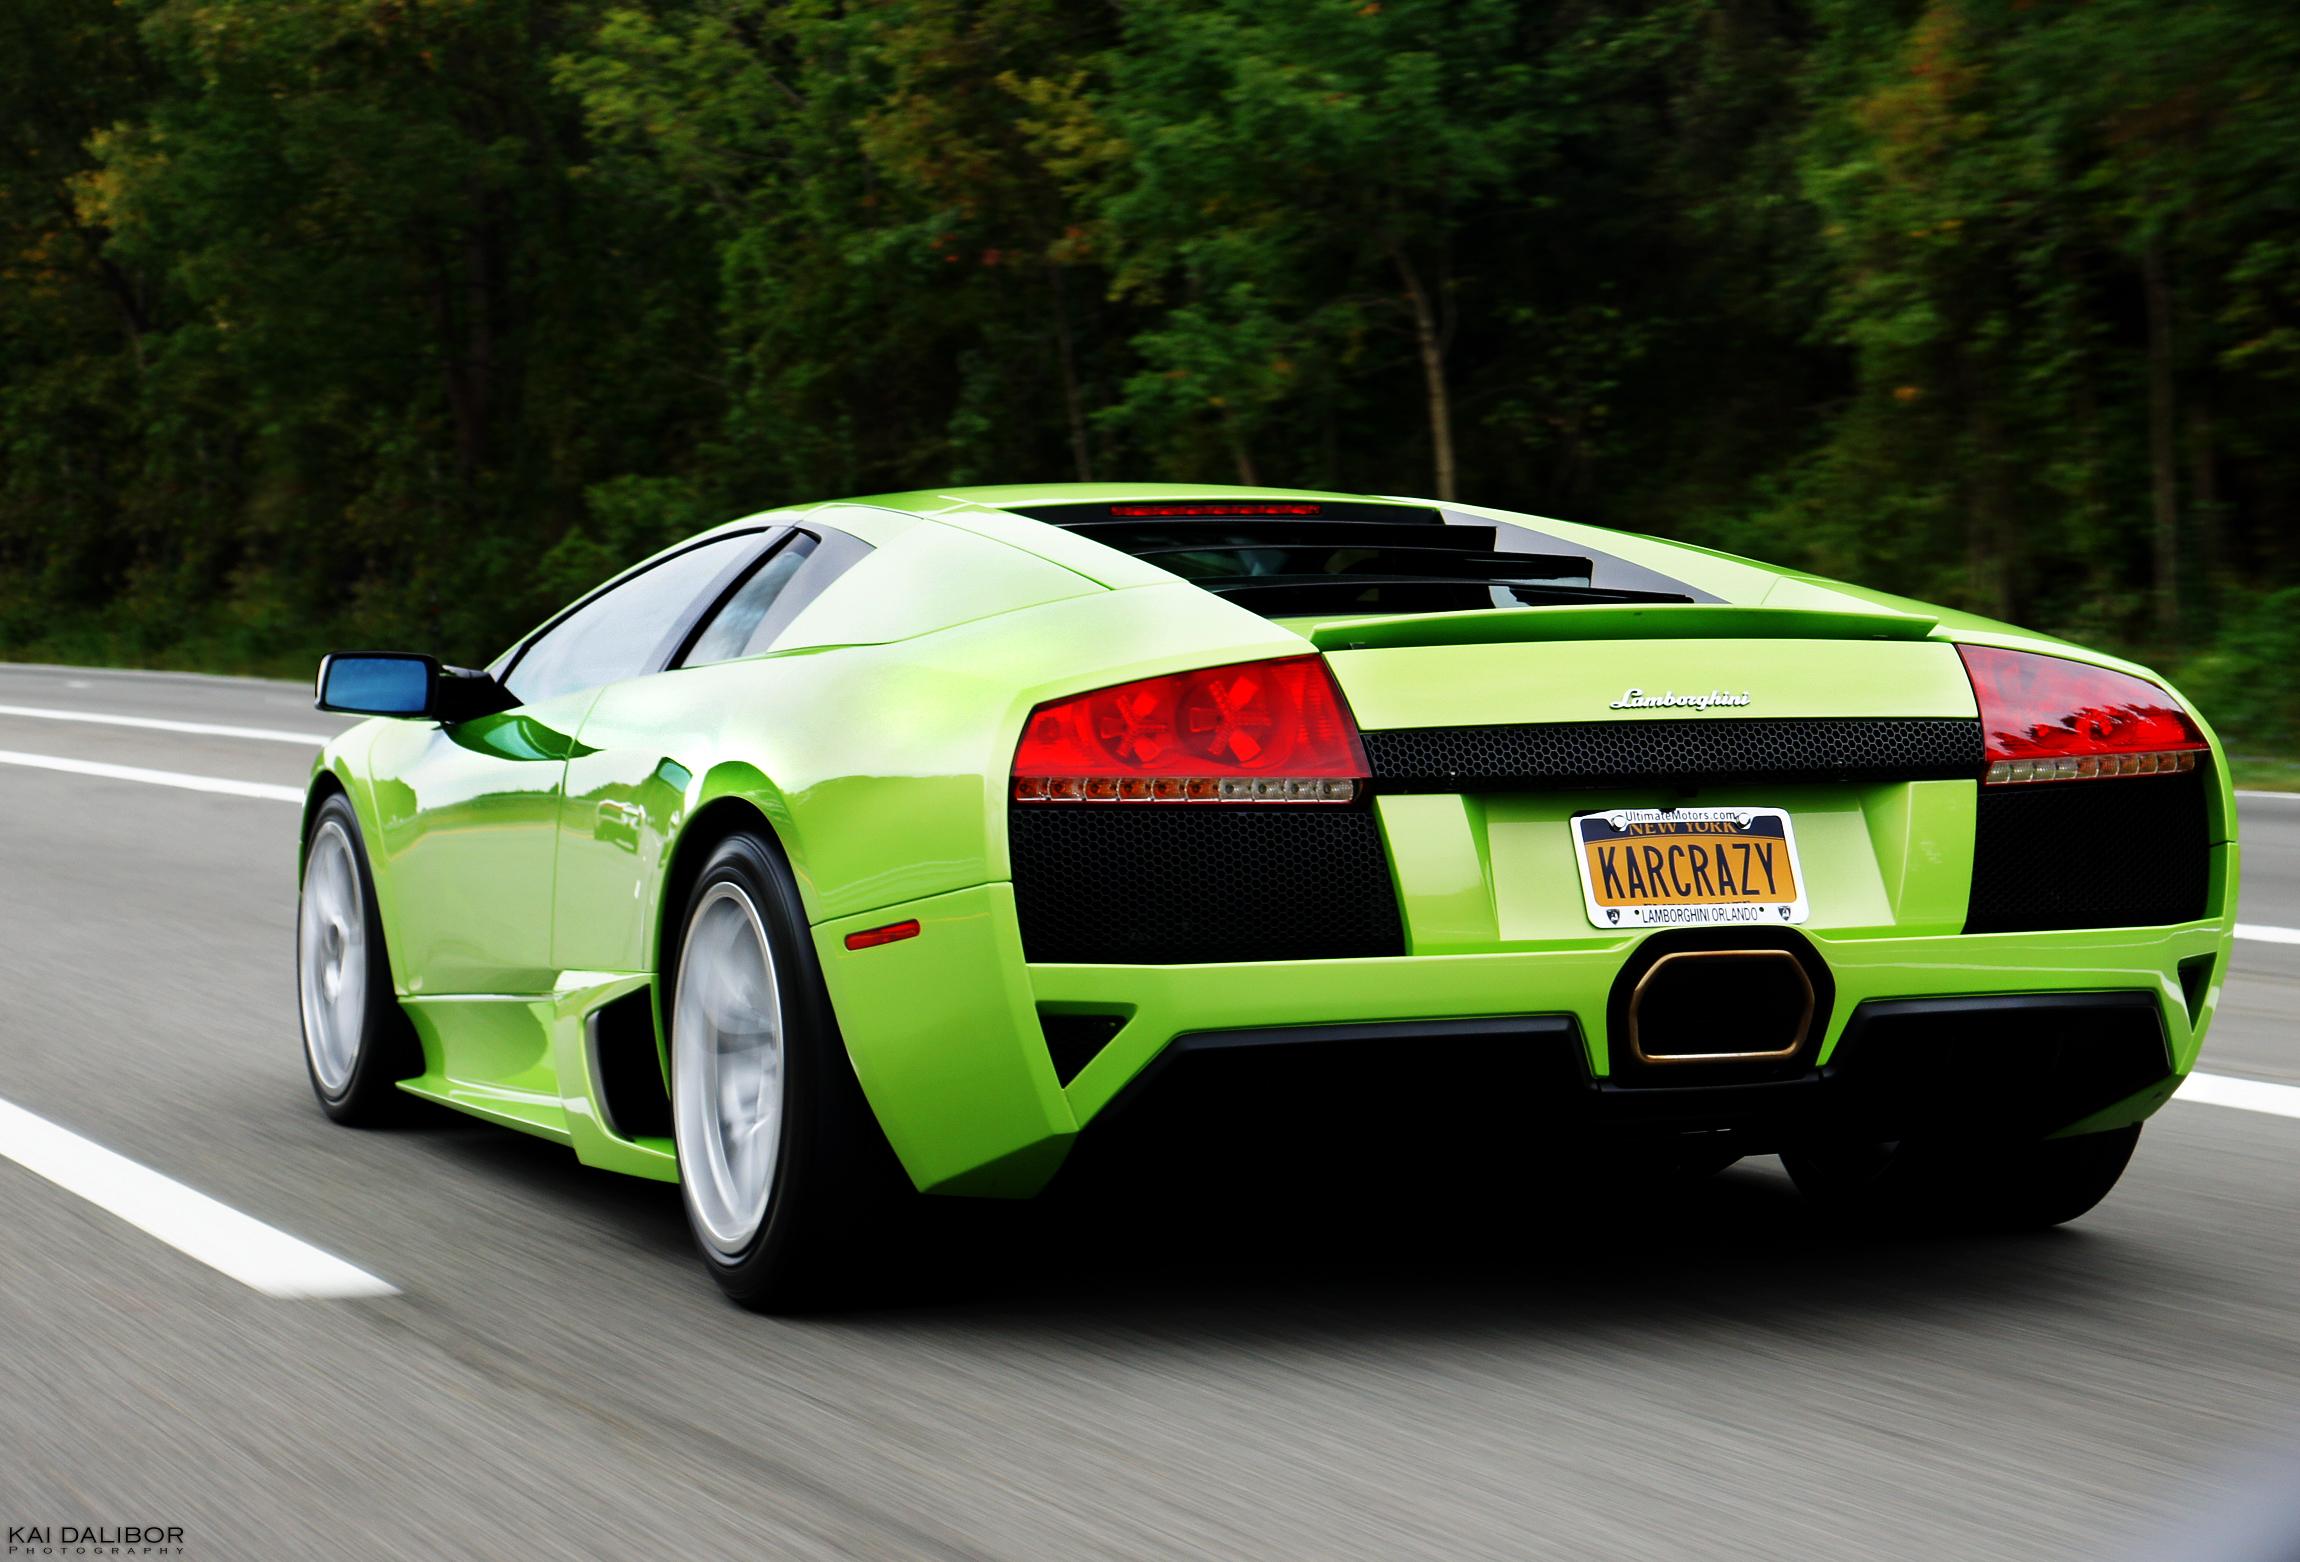 Wallpaper Green Sony Usa Lamborghini Gallardo Sports Car